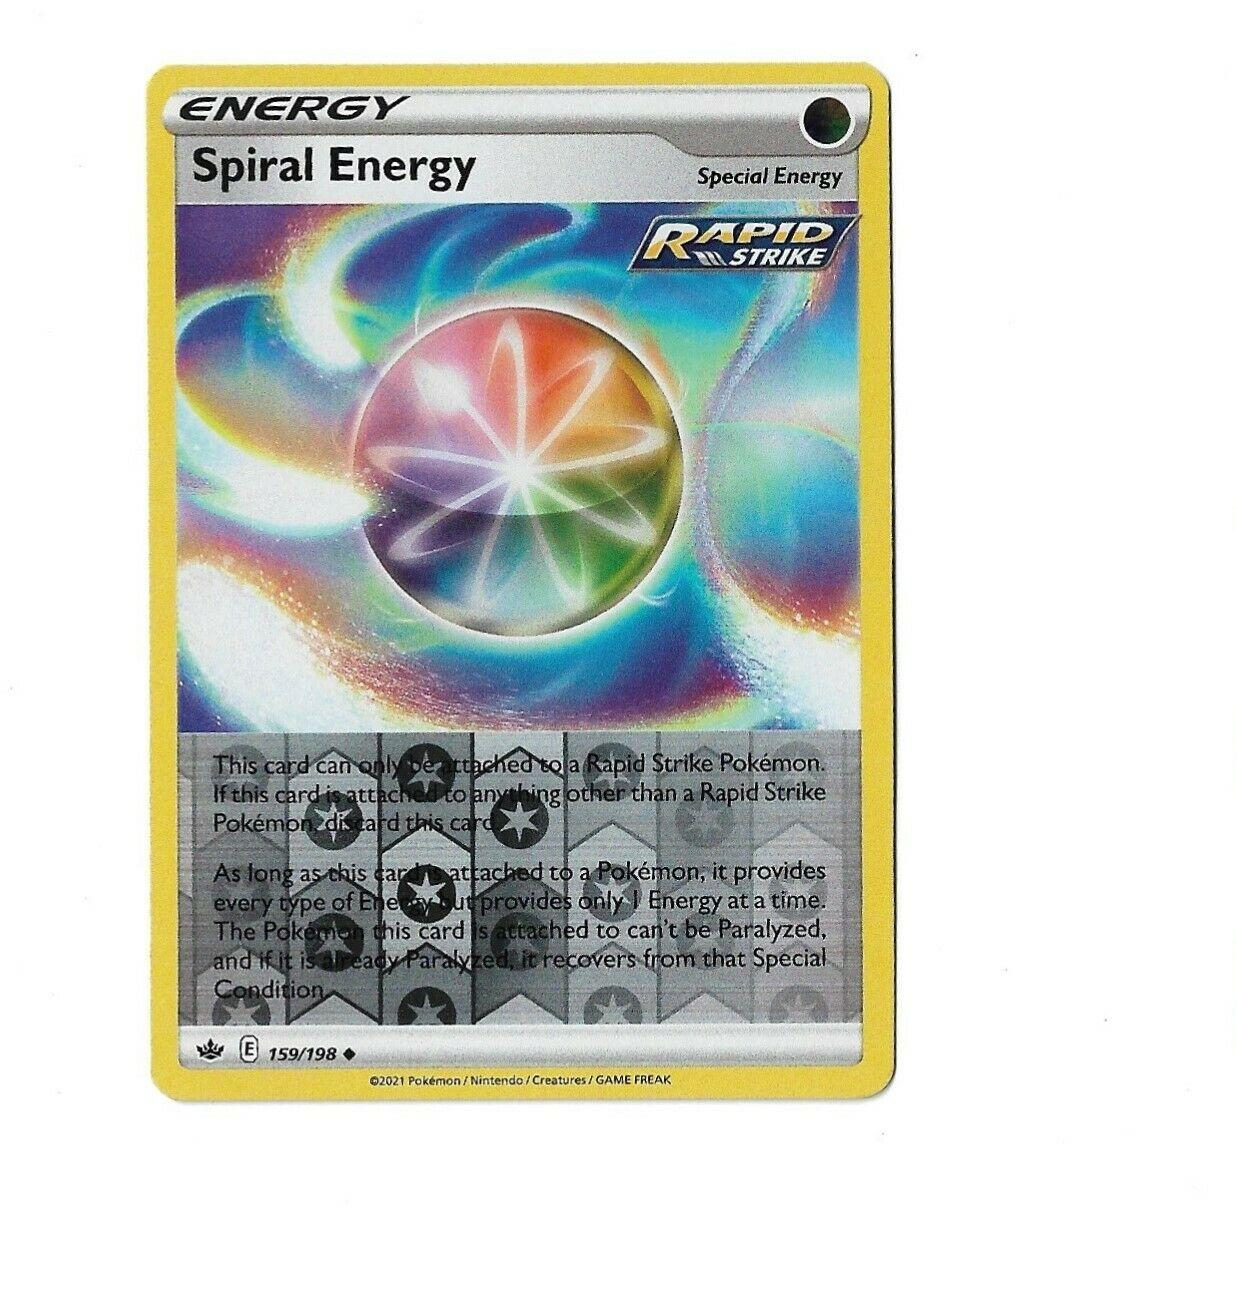 Pokemon TCG Chilling reign reverse holo Spiral Energy 159/198 NM